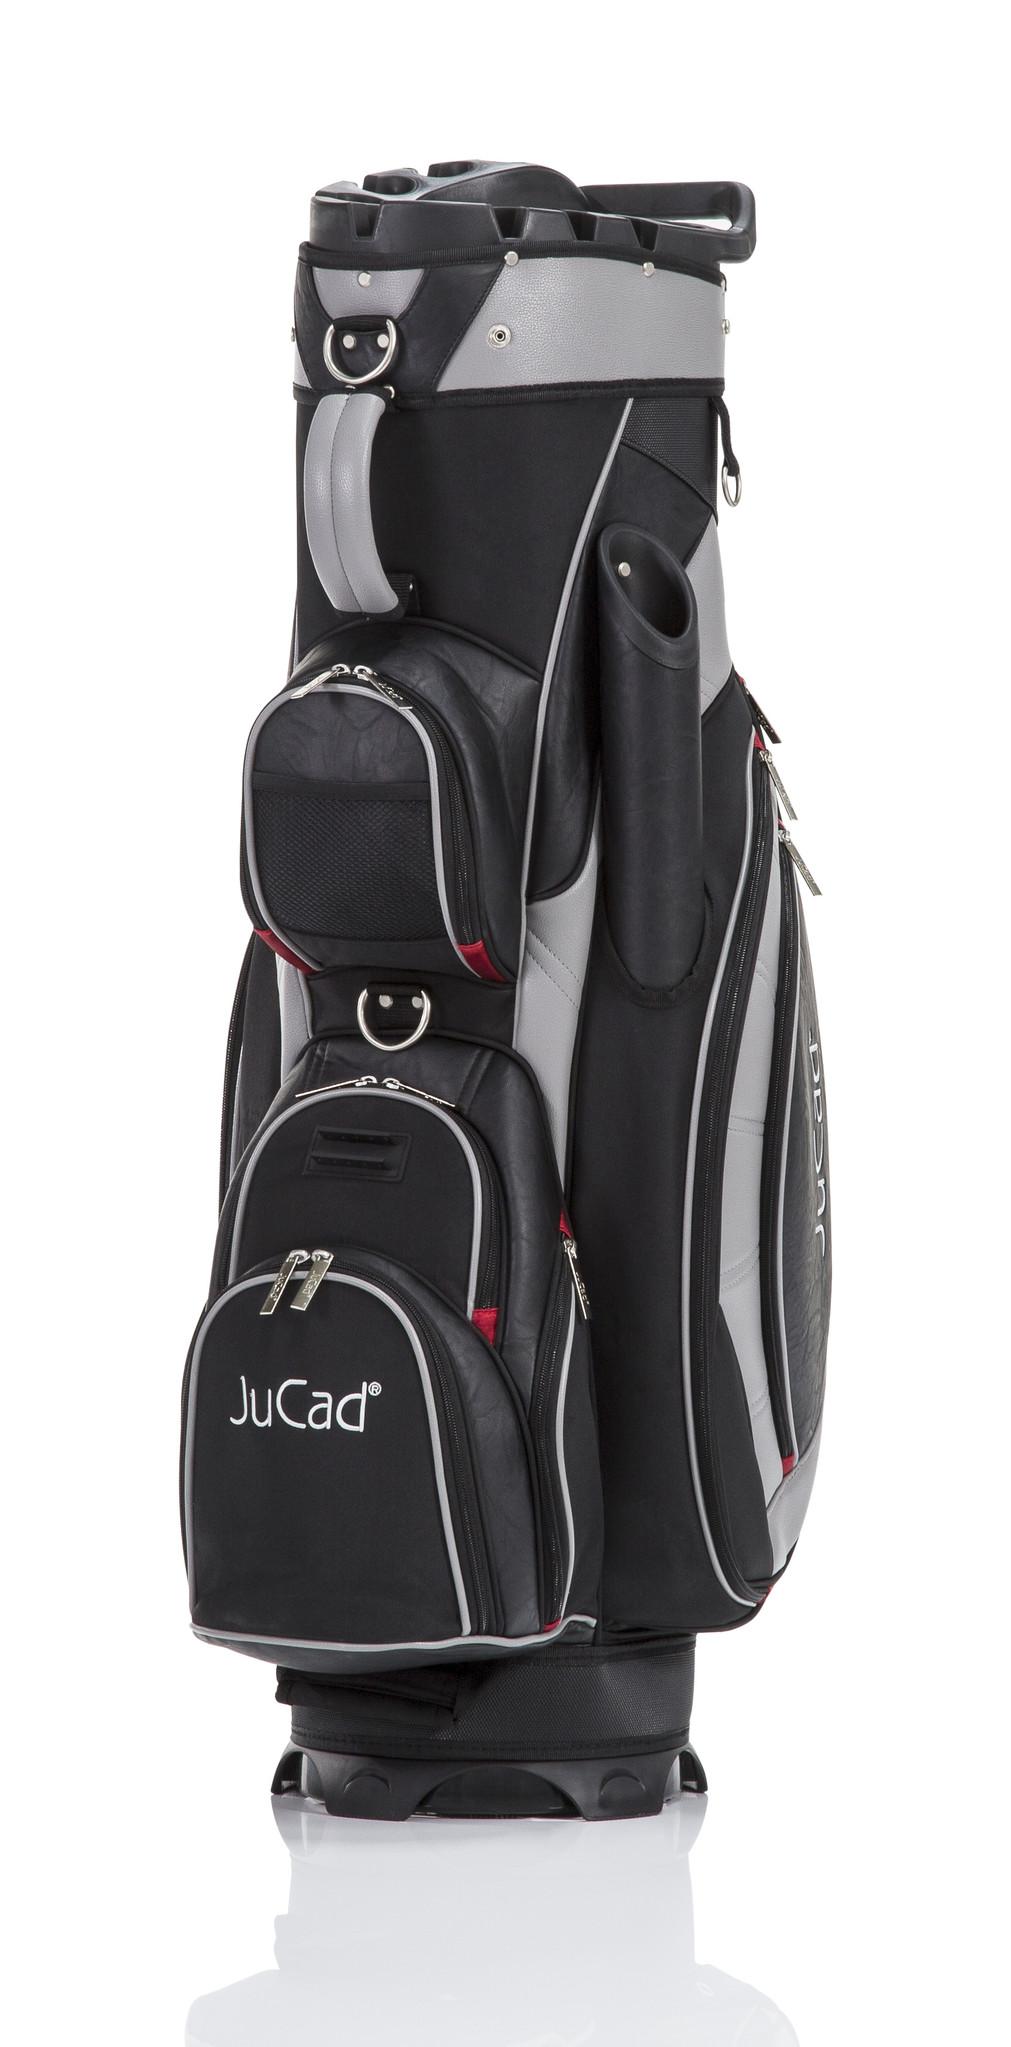 JuCad JuCad Manager (Black Titanium)